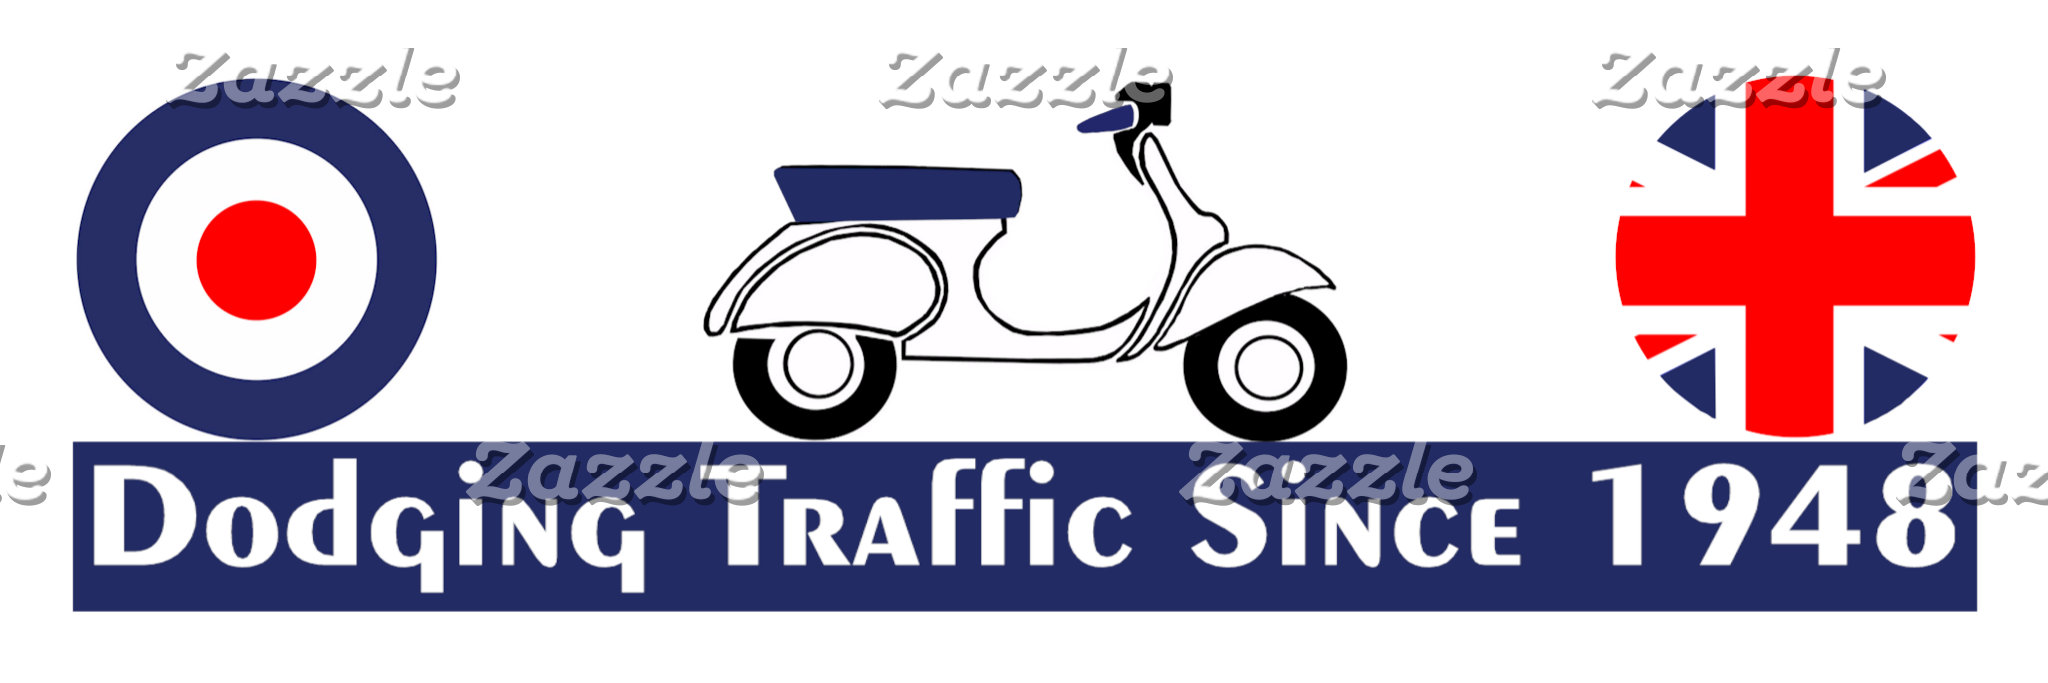 Vintage Scooter - Dodging Traffic Since 1948